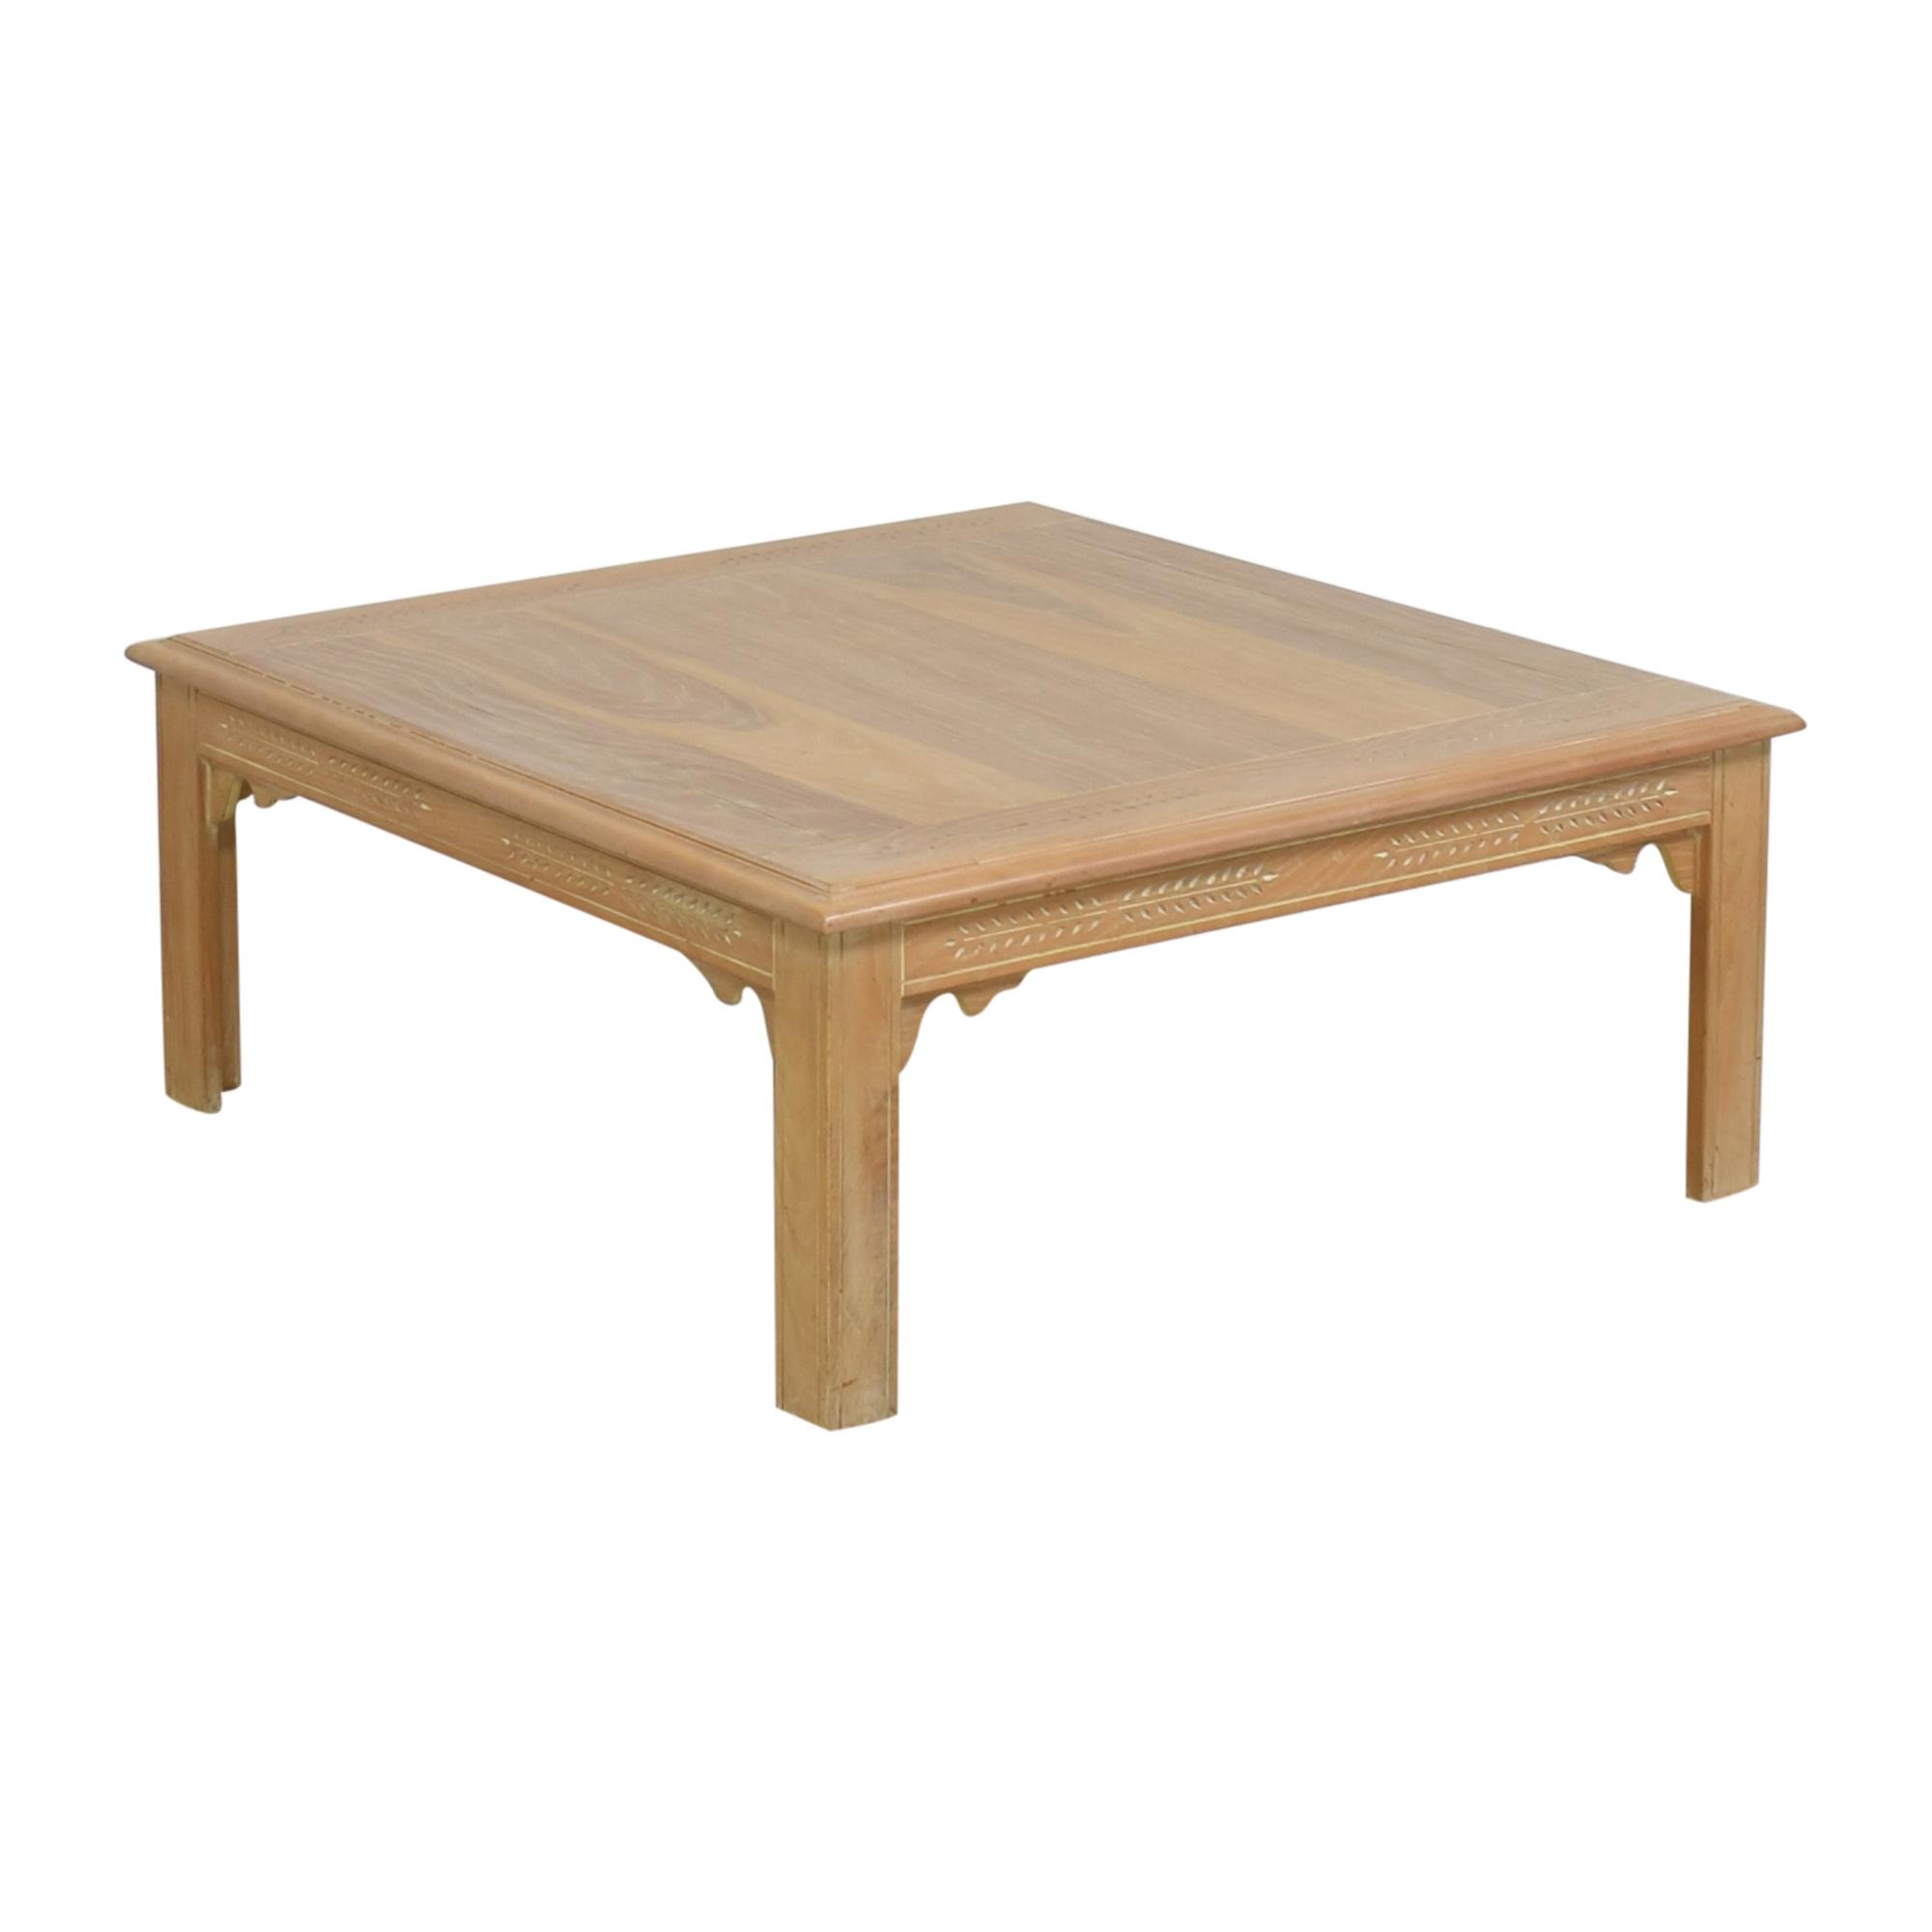 buy Lane Furniture Virginia Maid Coffee Table Lane Furniture Coffee Tables